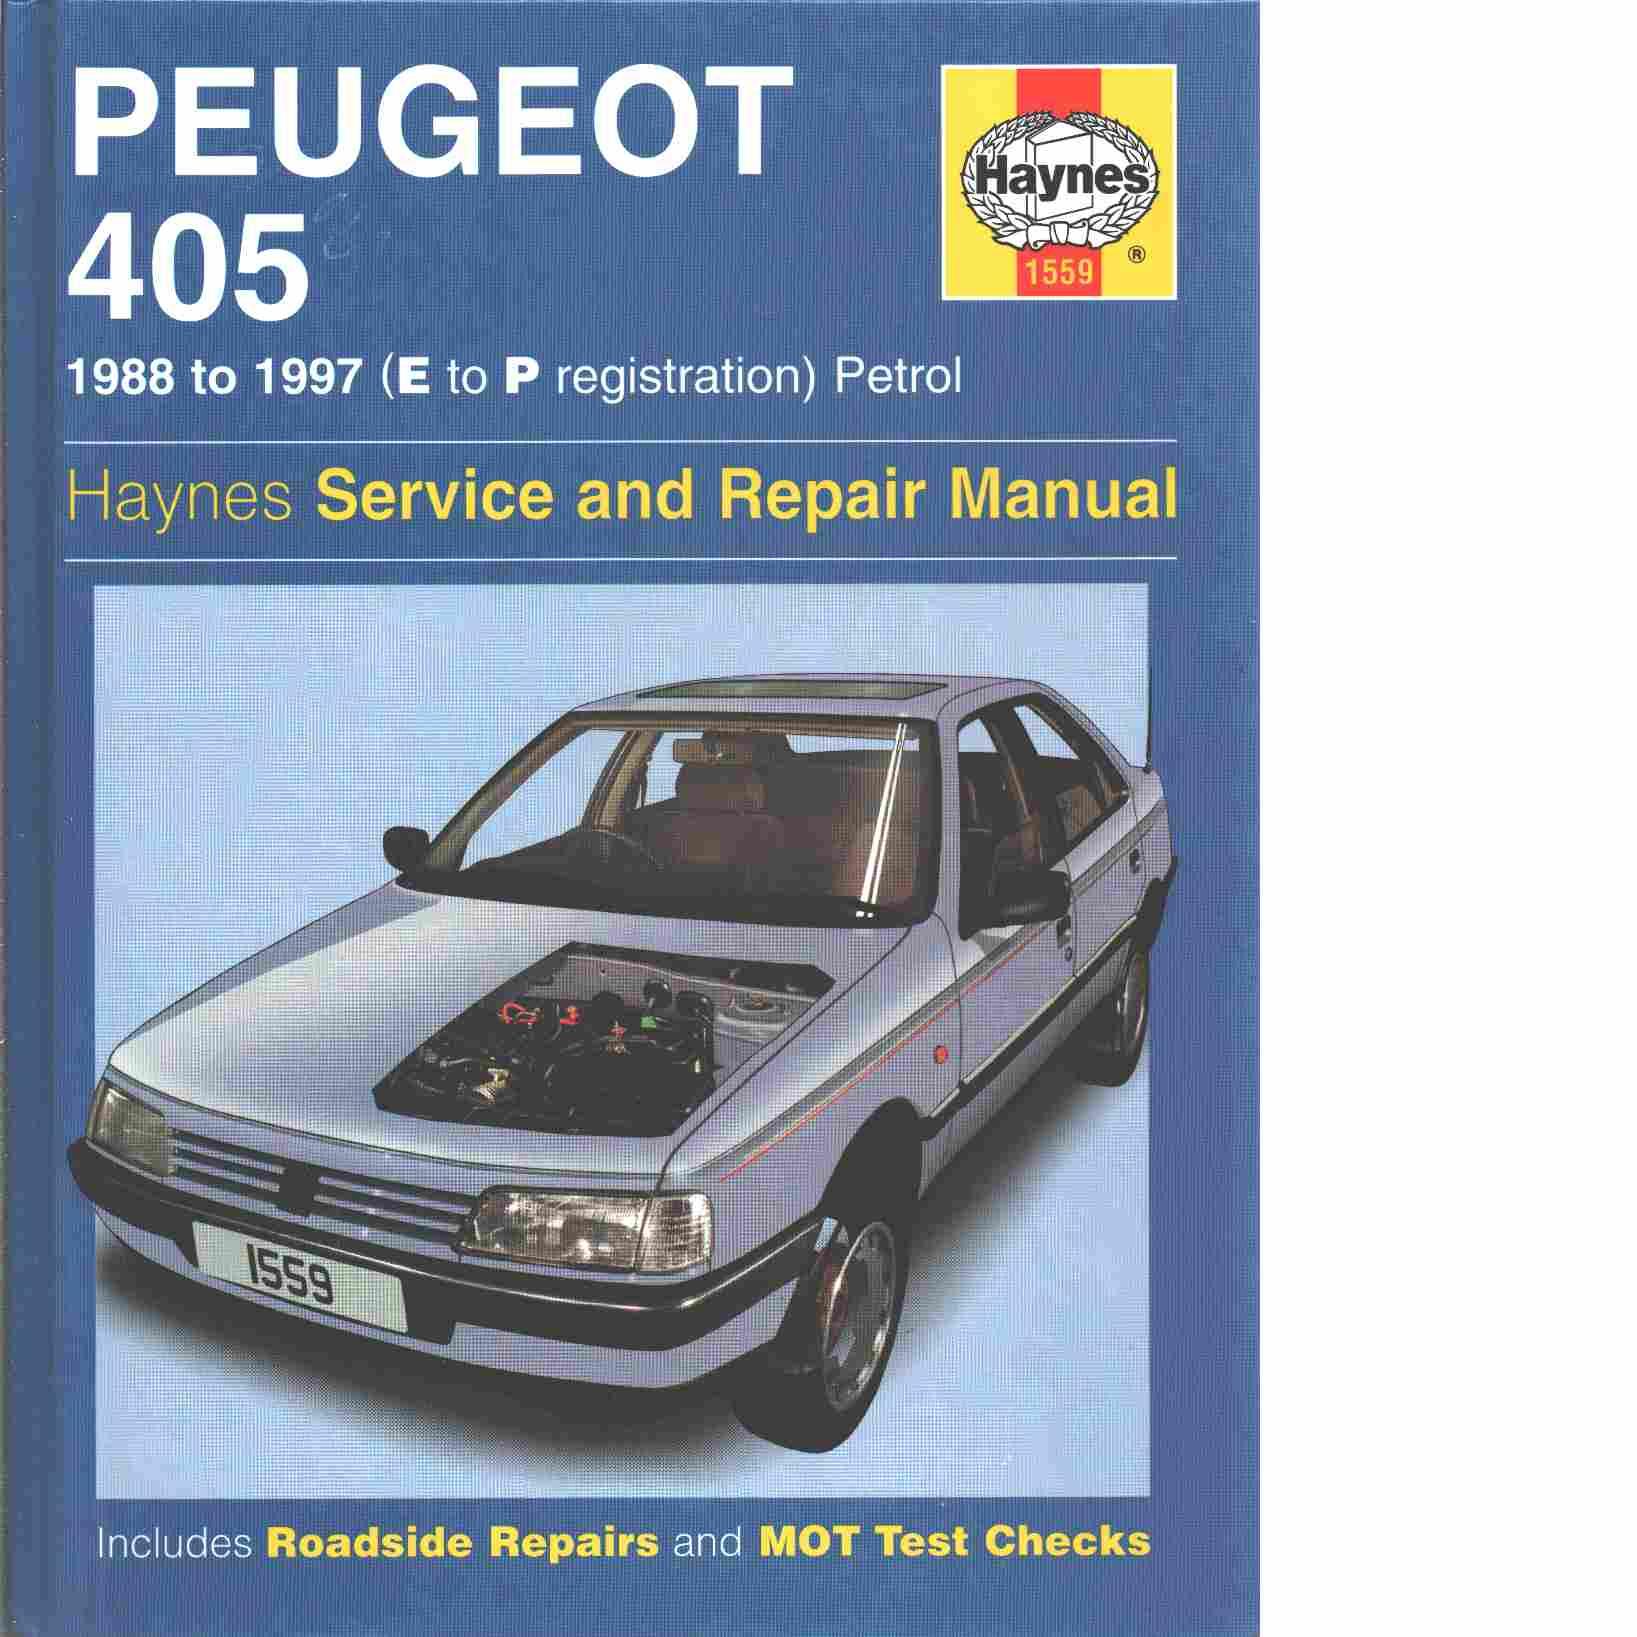 peugeot 405 petrol service repair manual rendle steve. Black Bedroom Furniture Sets. Home Design Ideas